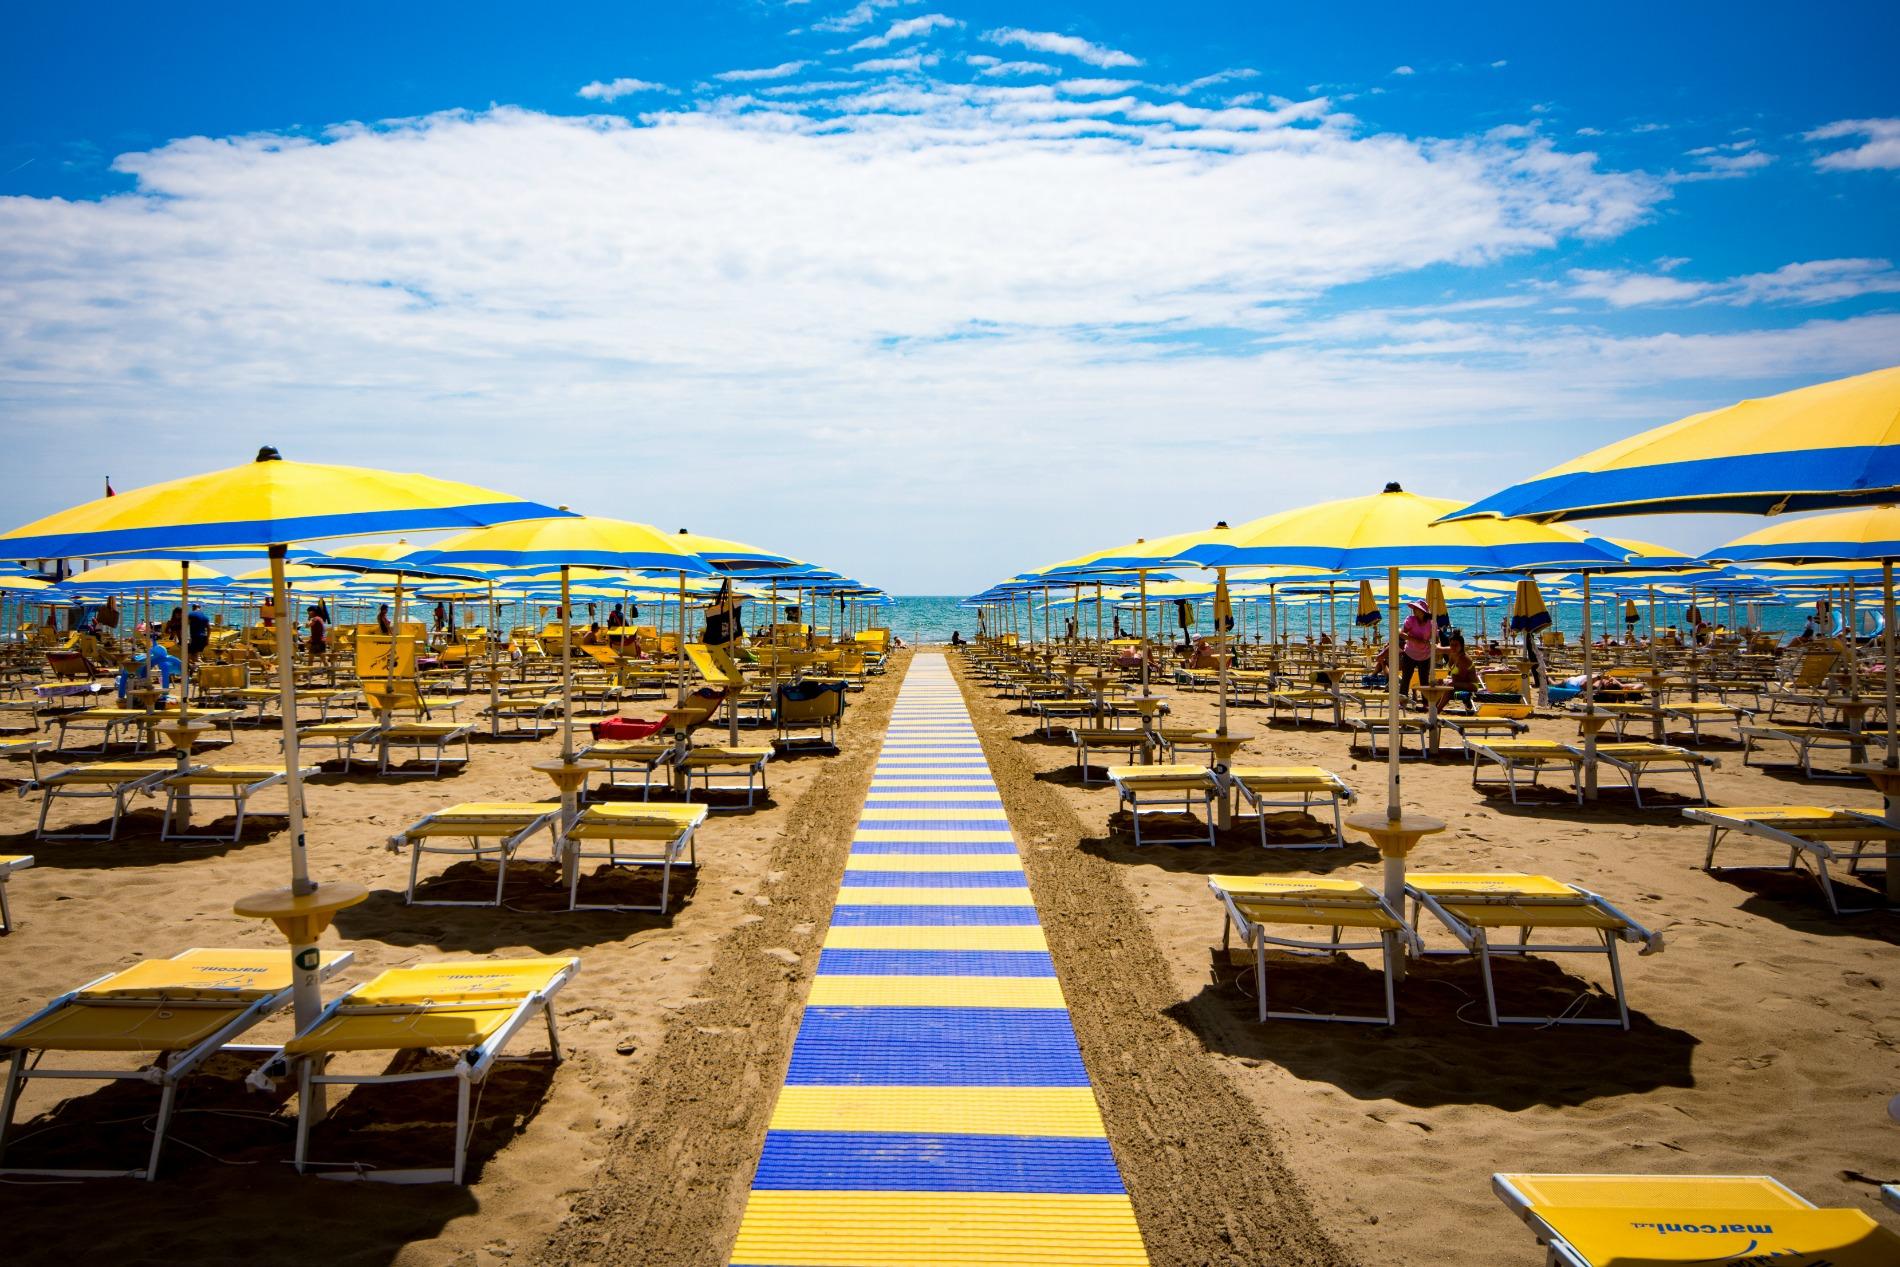 http://www.hotelvenezuela.it/wp-content/uploads/2016/02/spiaggia1.jpeg